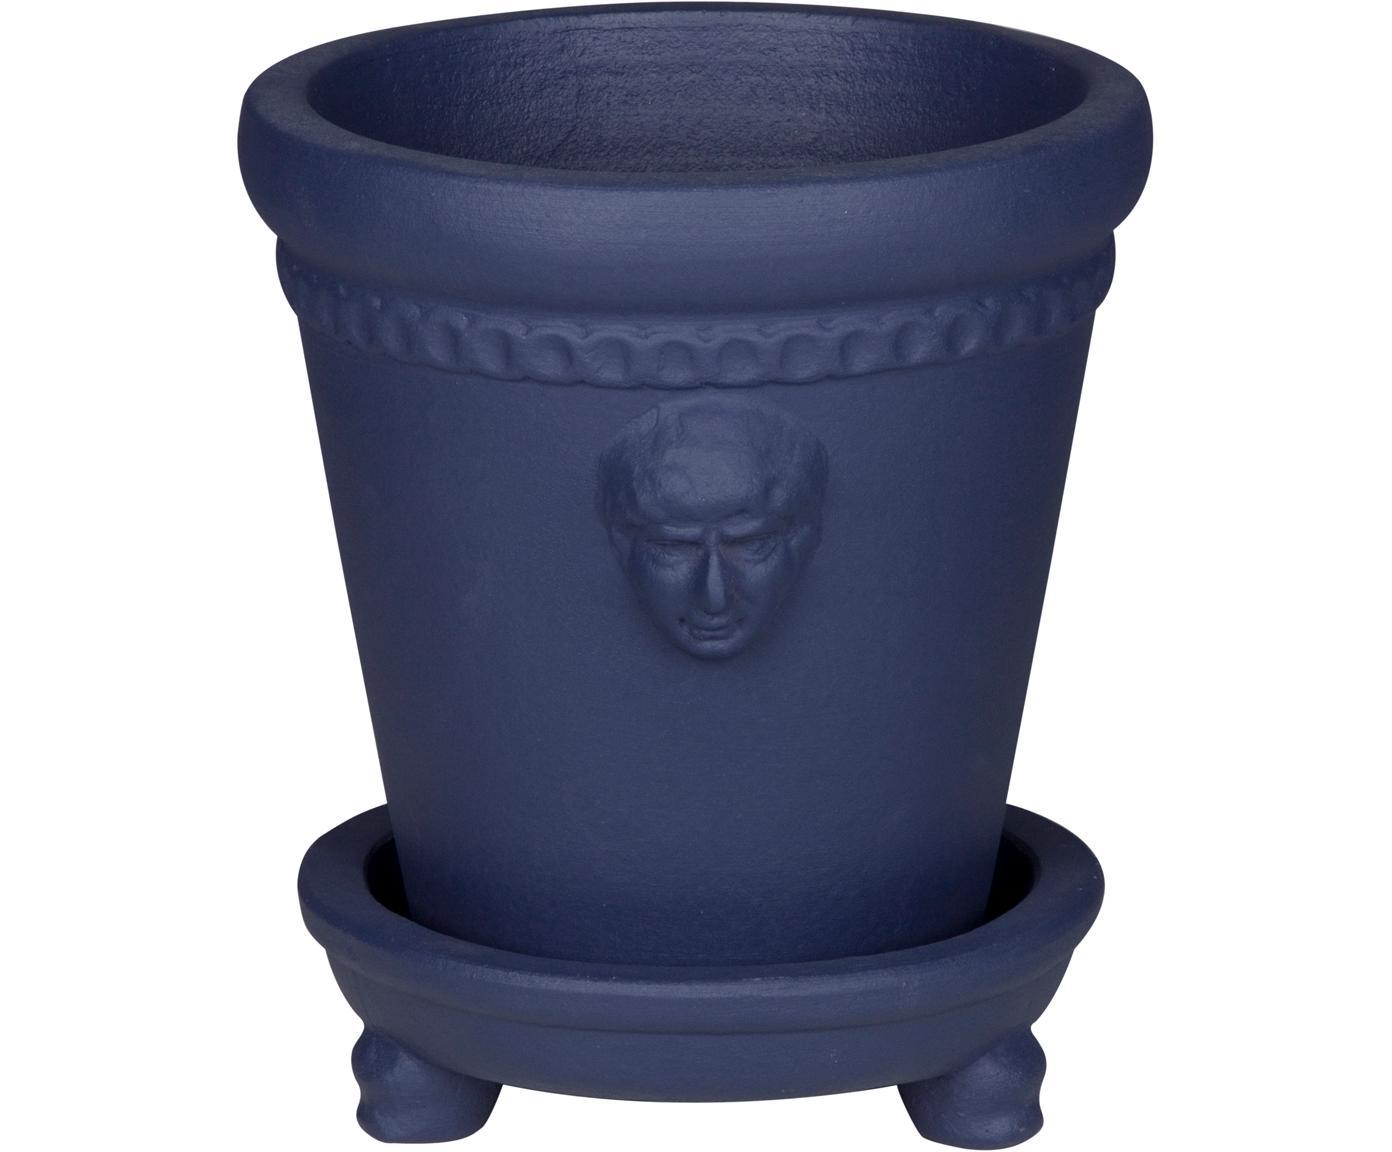 Übertopf Ceasar aus Terrakotta, Terrakotta, Blau, Ø 17 x H 20 cm